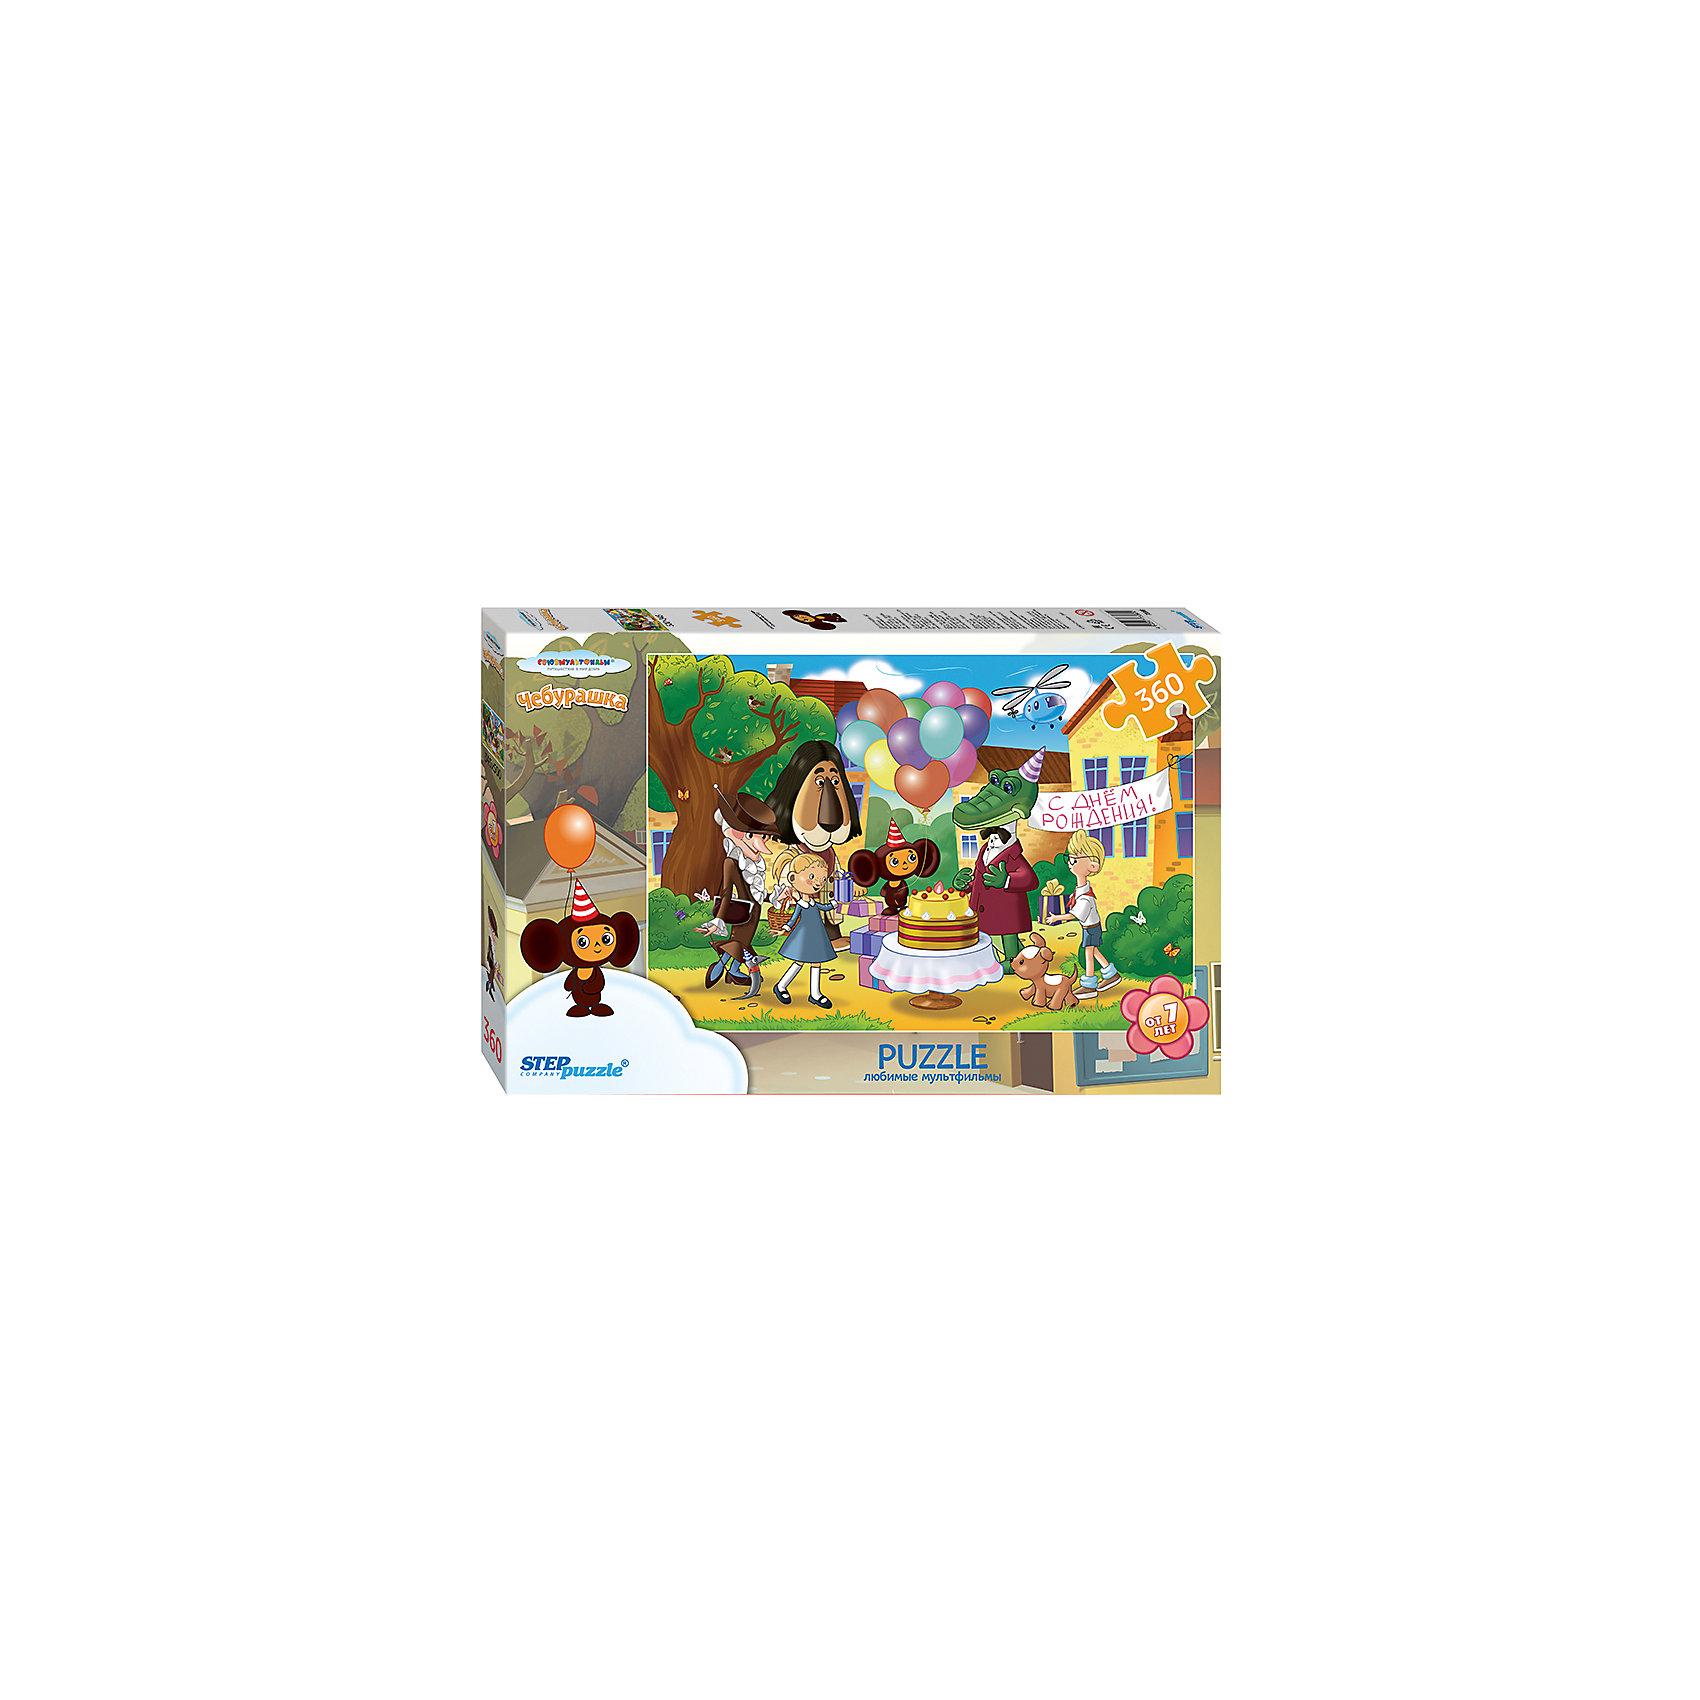 Степ Пазл Пазл Чебурашка, 360 деталей, Step Puzzle пазлы crystal puzzle 3d головоломка вулкан 40 деталей